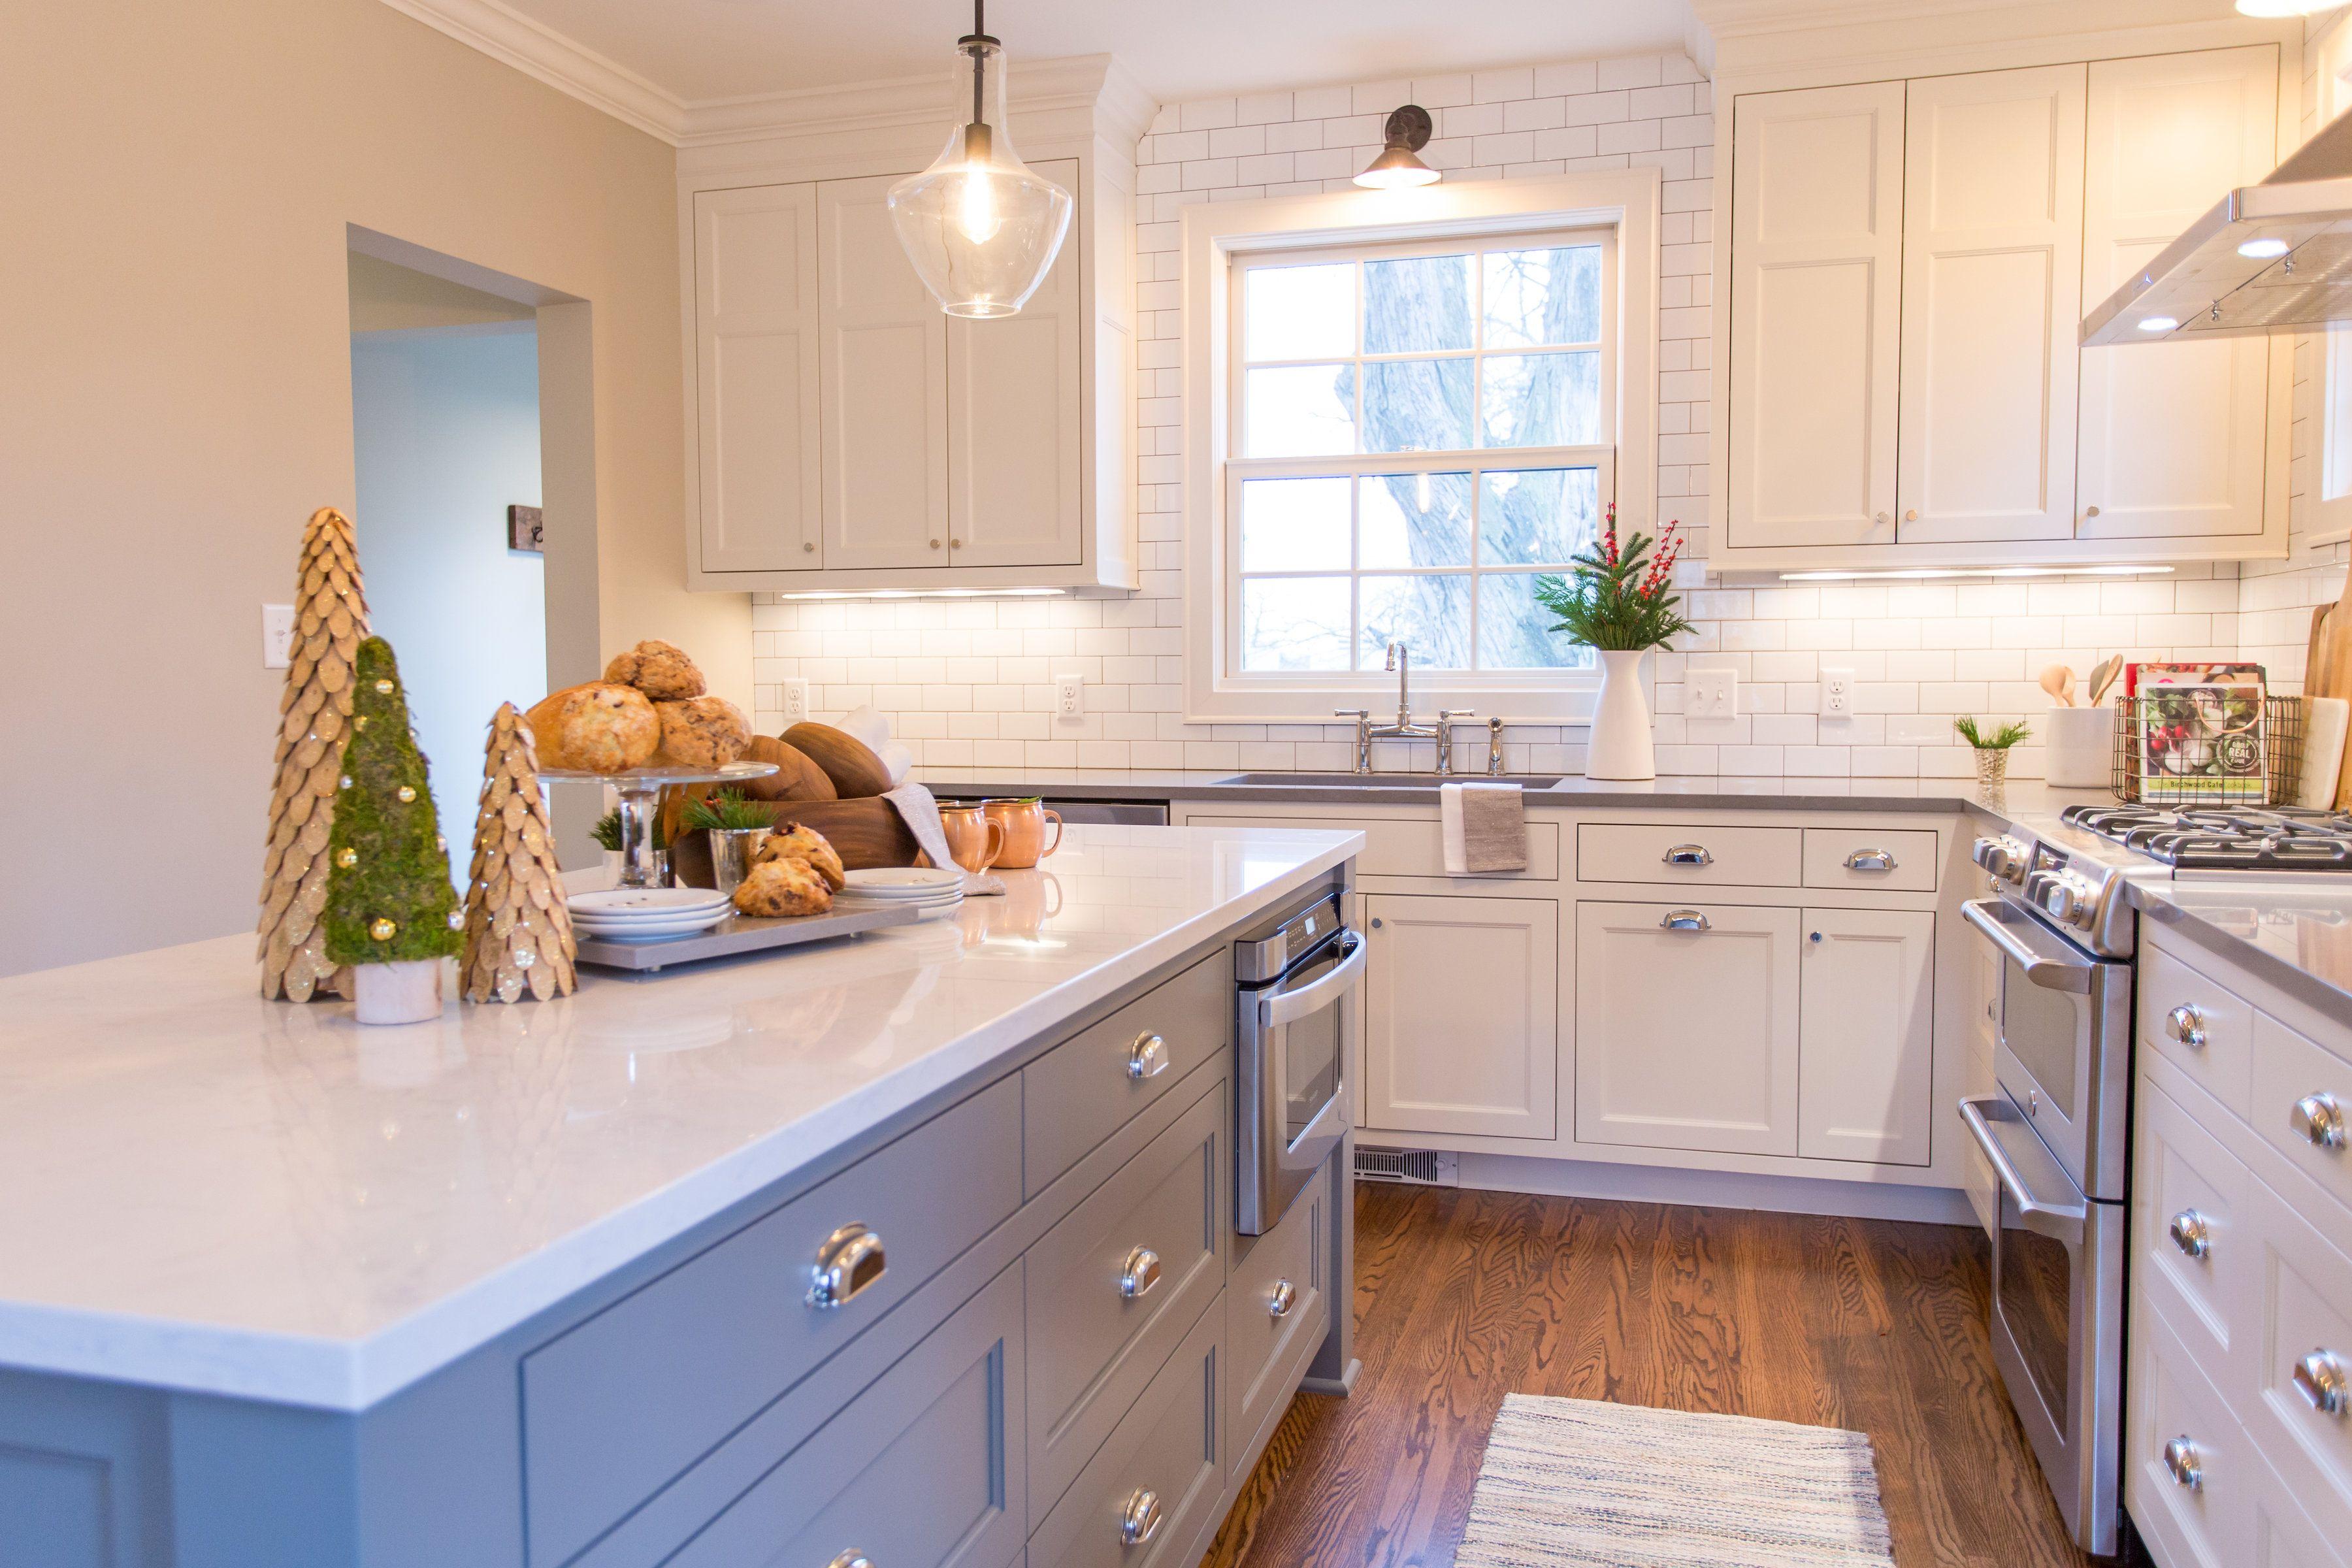 renovation kitchen pin restoration s countertop cambriaquartz